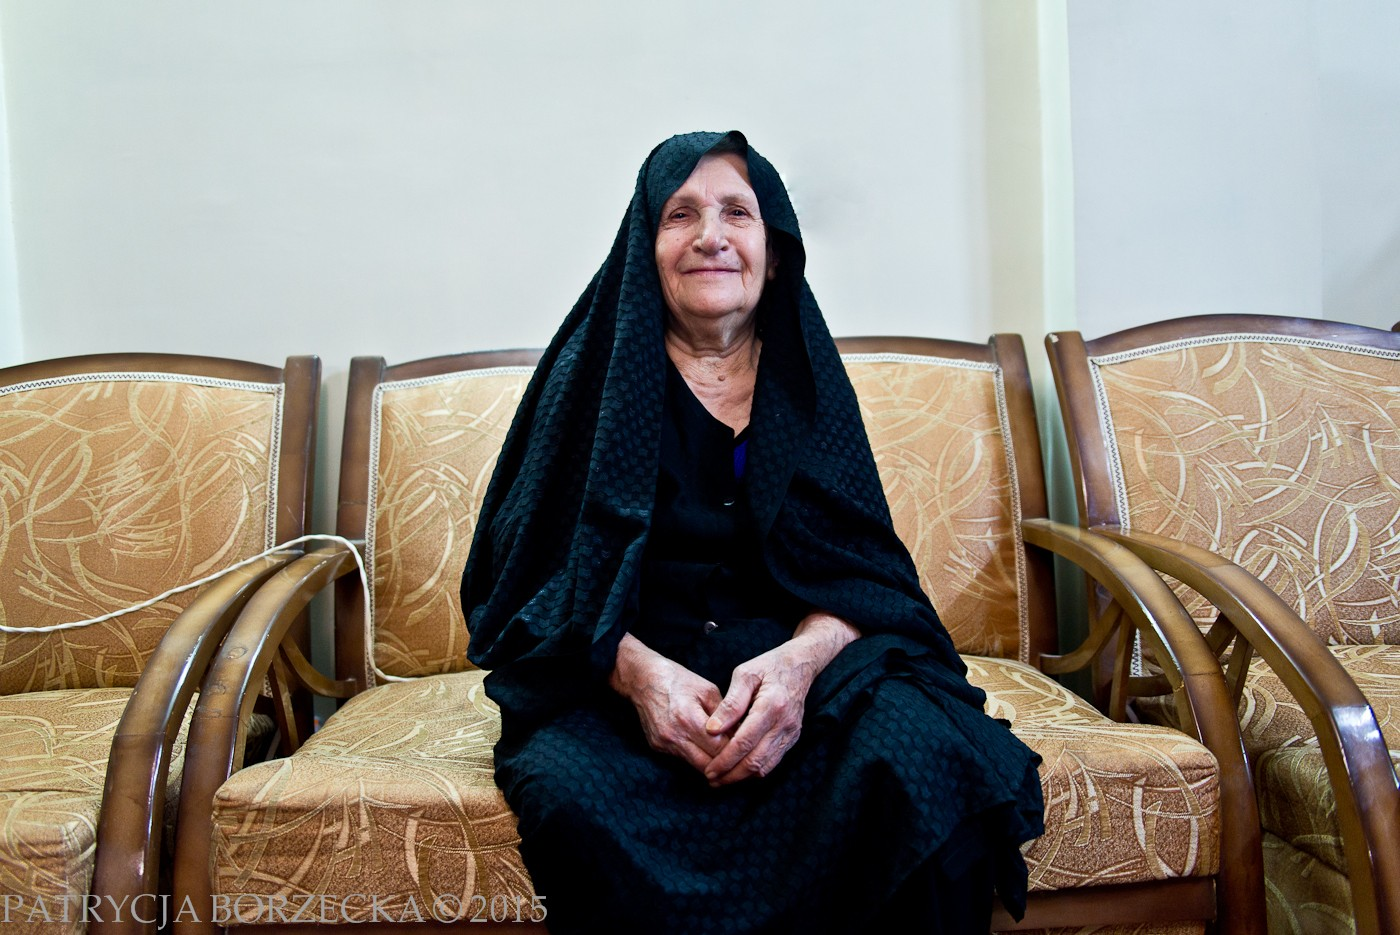 PatrycjaBorzecka-photography-Iran-people01